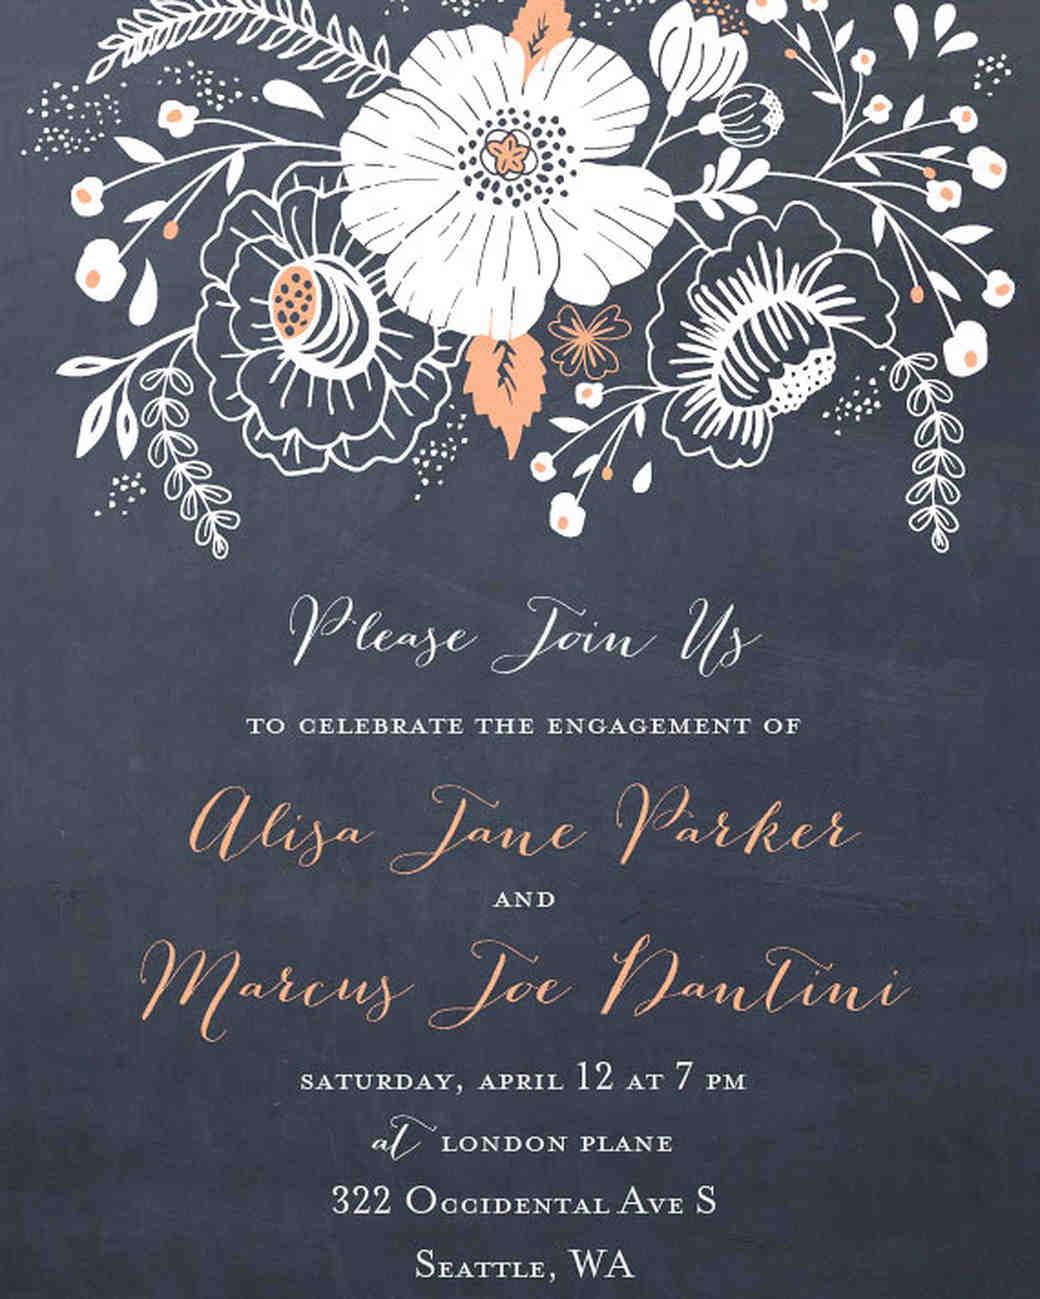 paperless-engagement-party-invitations-greenvelope-hanging-gardens-0416.jpg